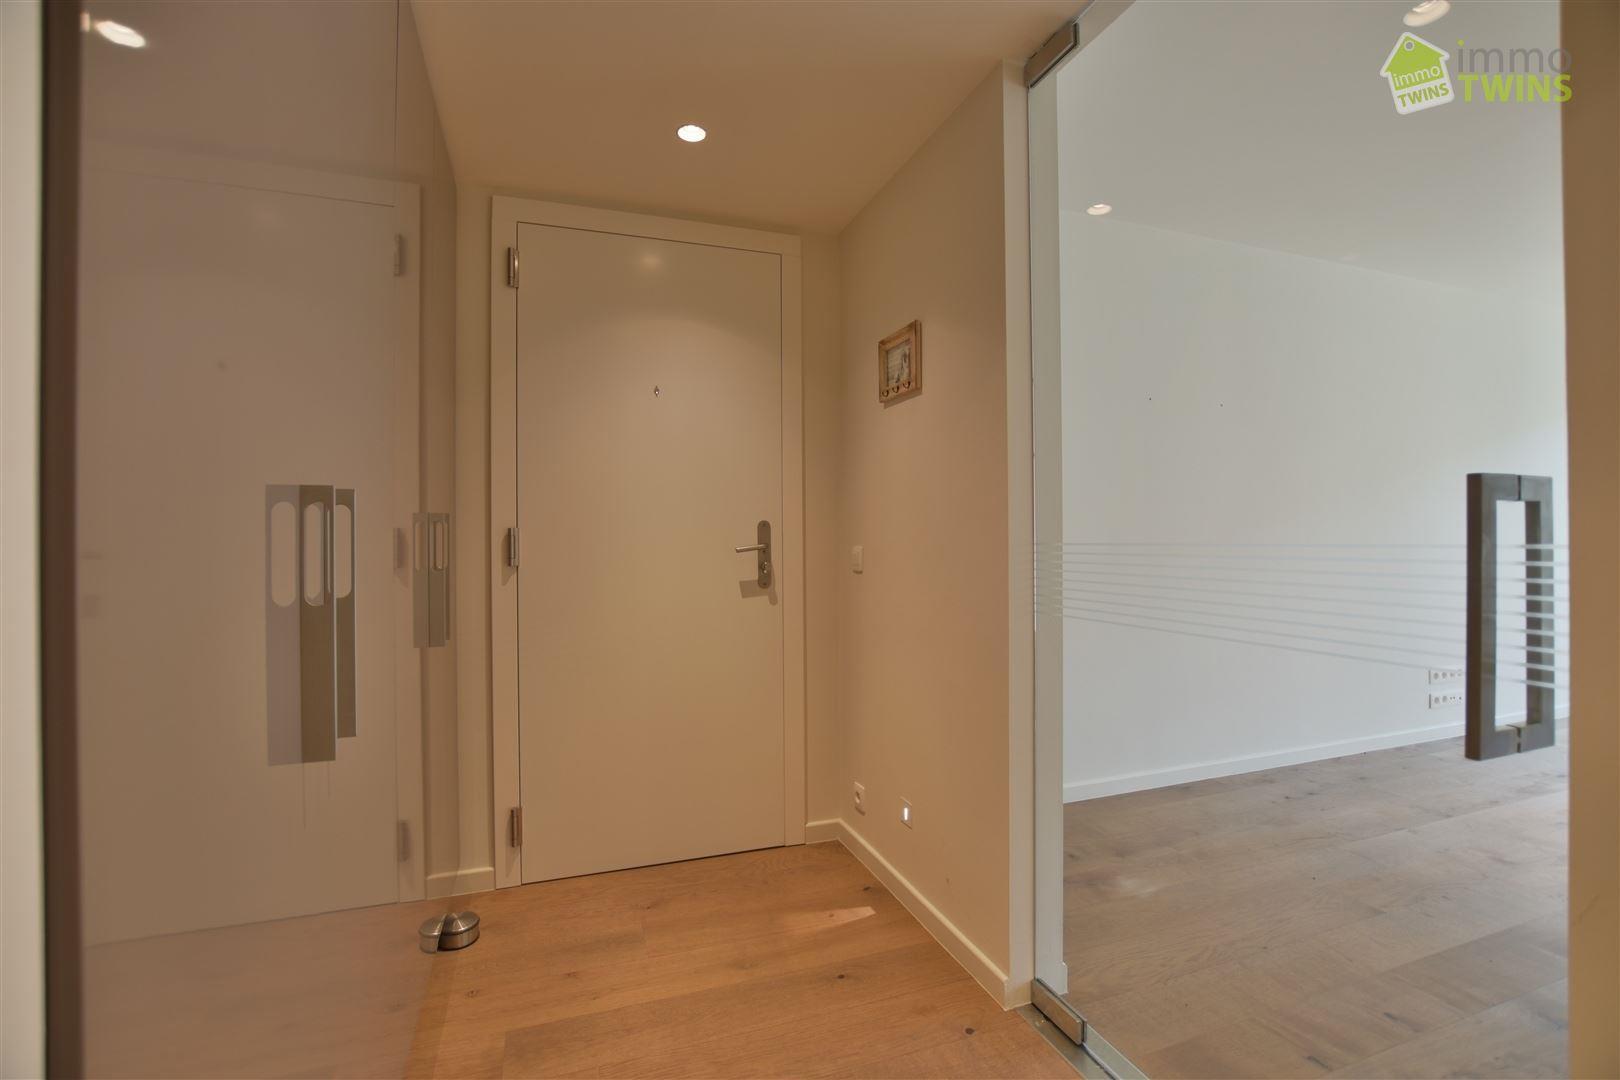 Foto 8 : Appartement te 9200 DENDERMONDE (België) - Prijs € 1.100